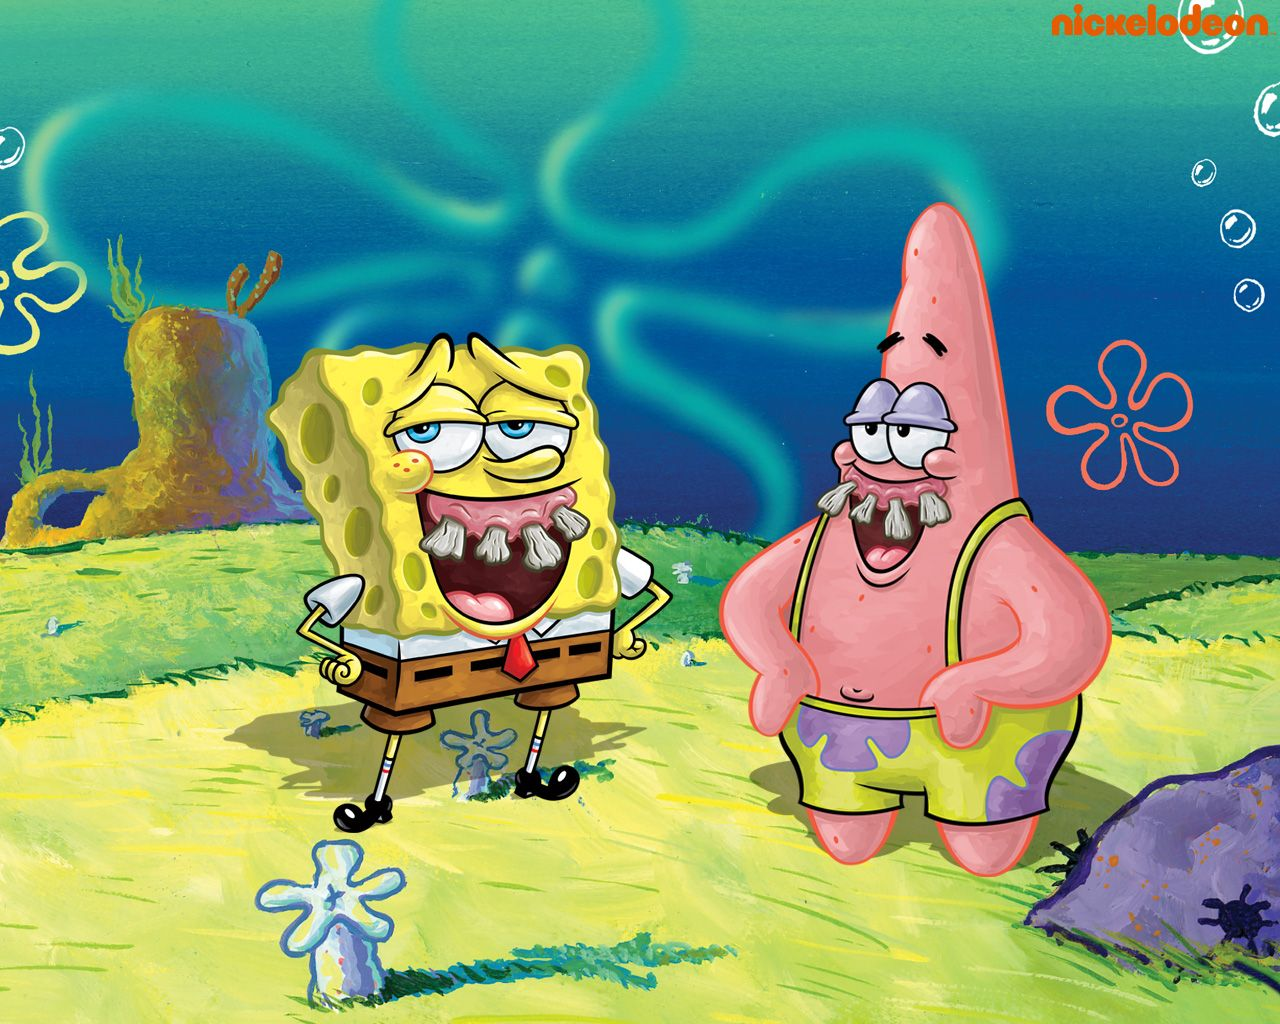 Spongebob patrick spongebob squarepants wallpaper